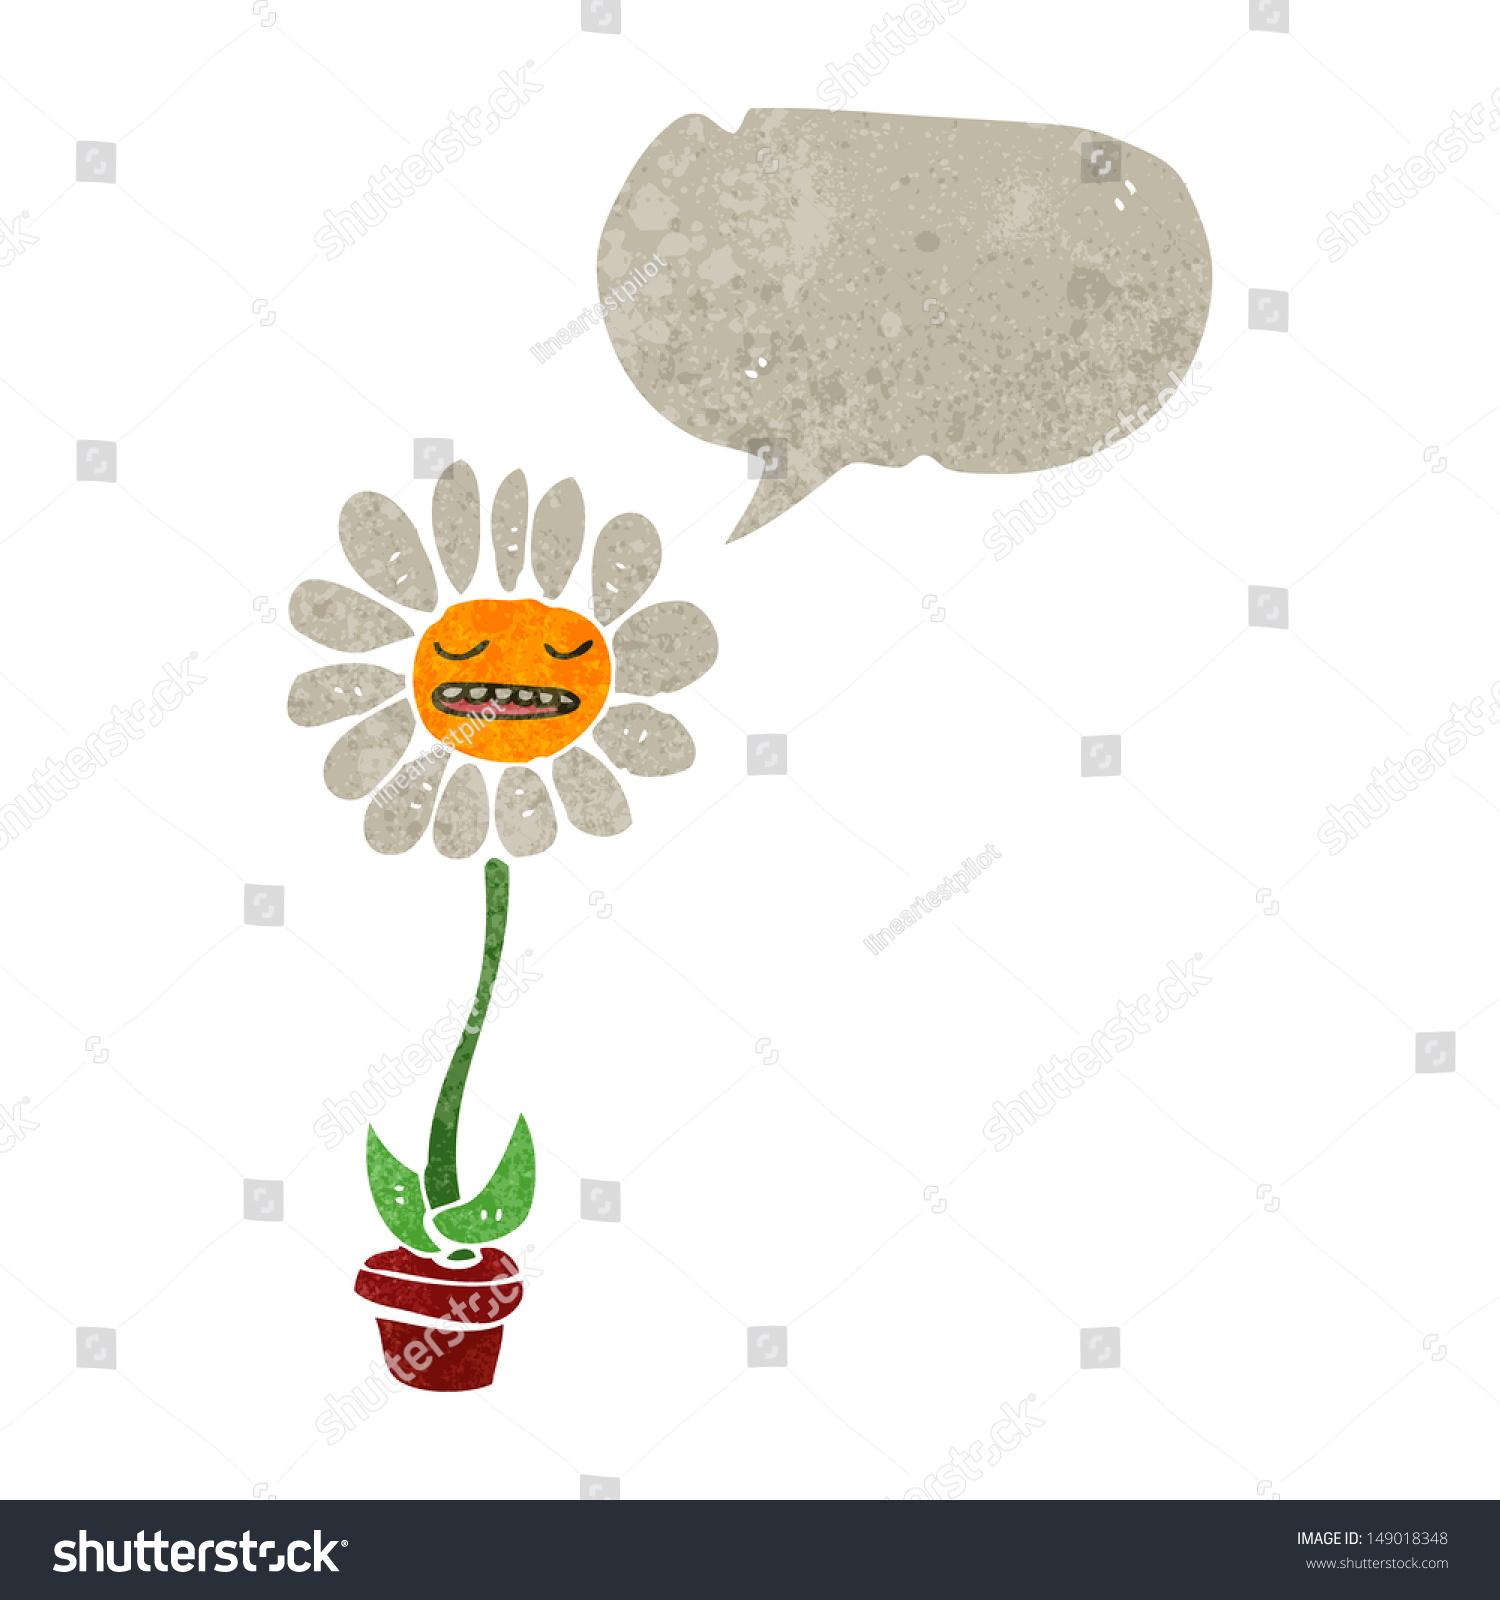 Retro cartoon daisy flower stock illustration 149018348 shutterstock retro cartoon daisy flower izmirmasajfo